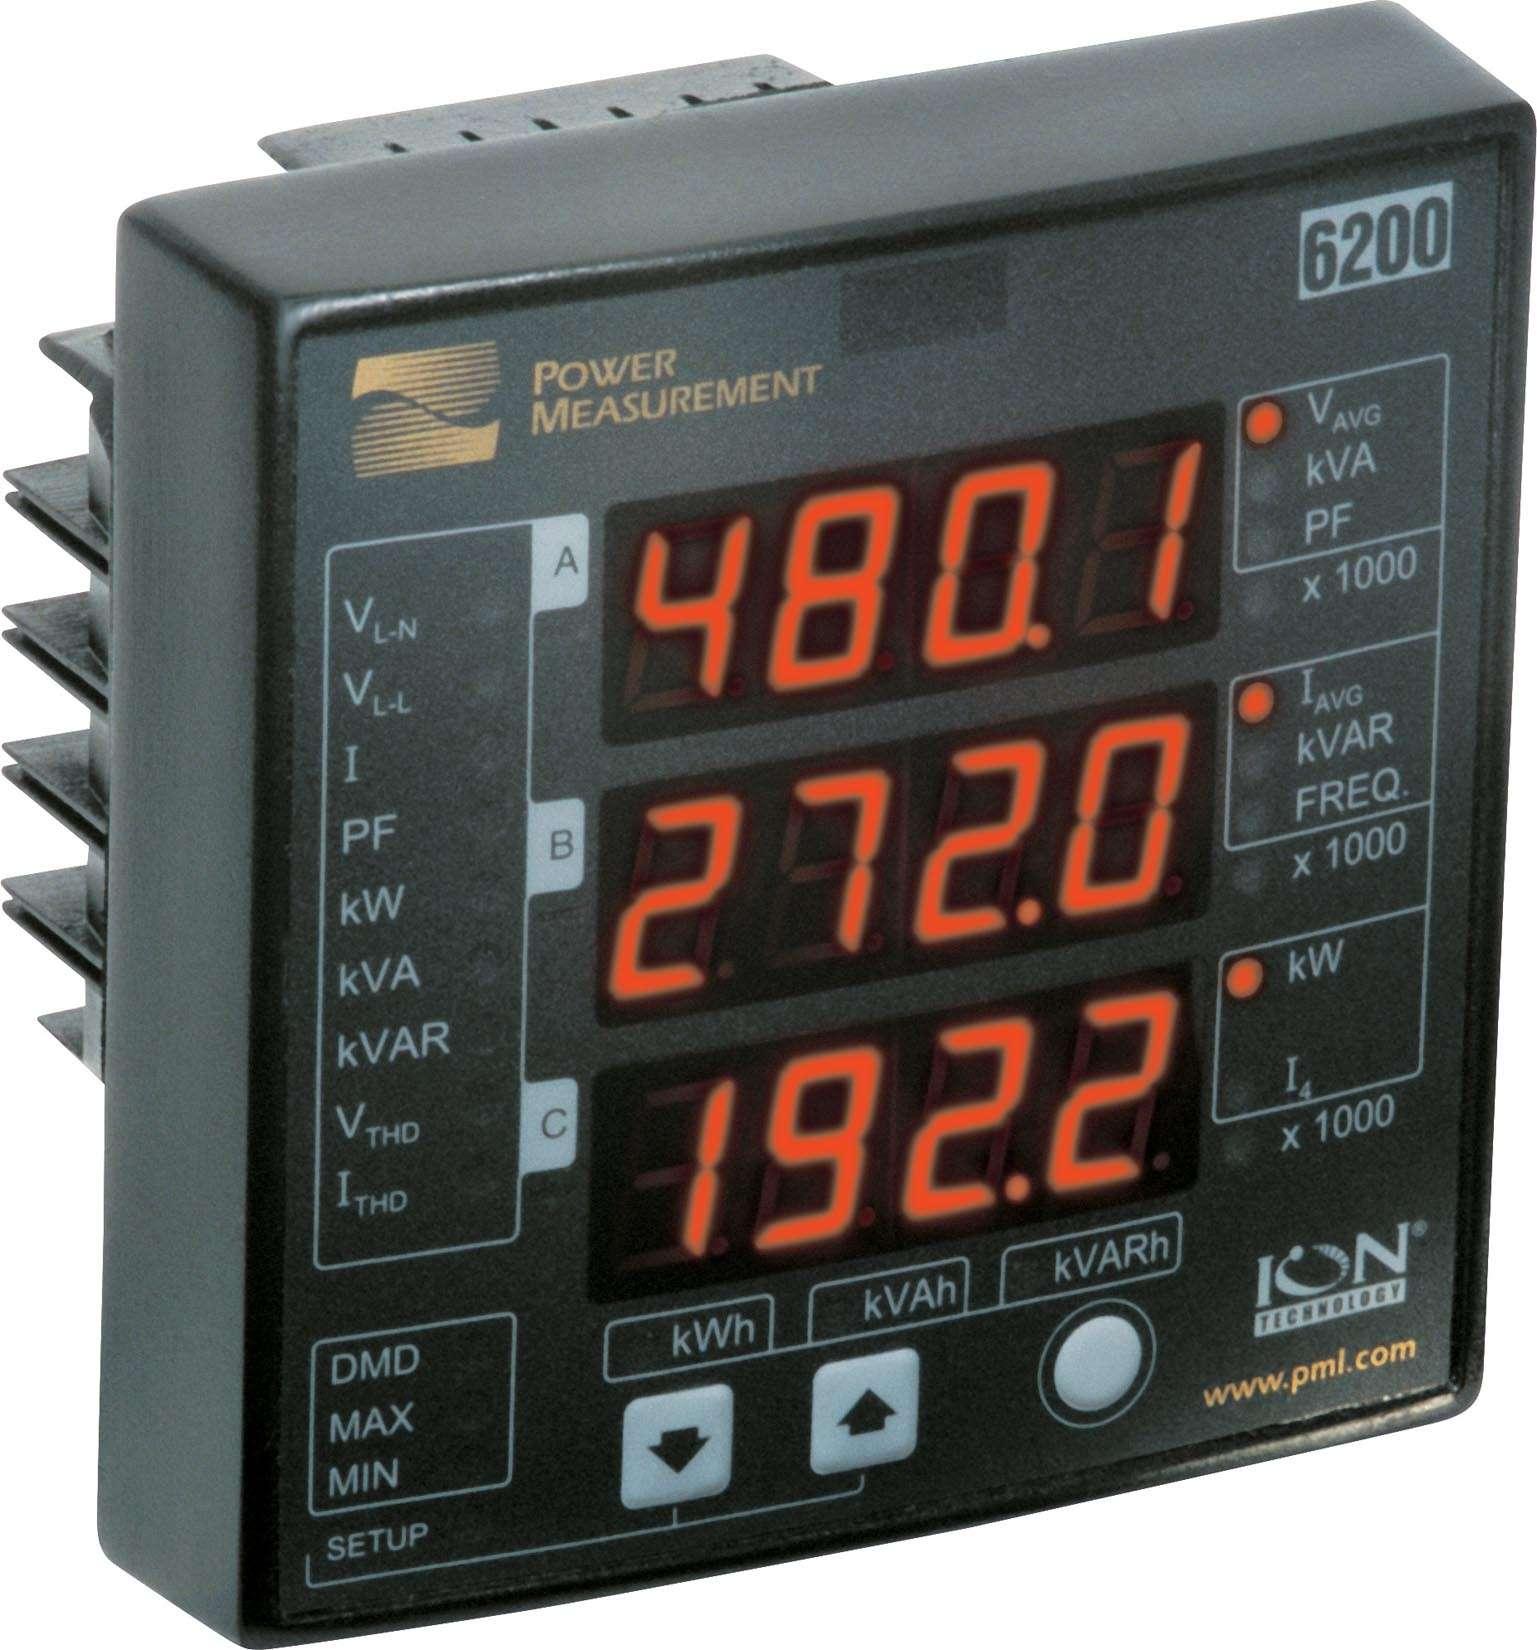 Power Demand Meter : High voltage power demand meter